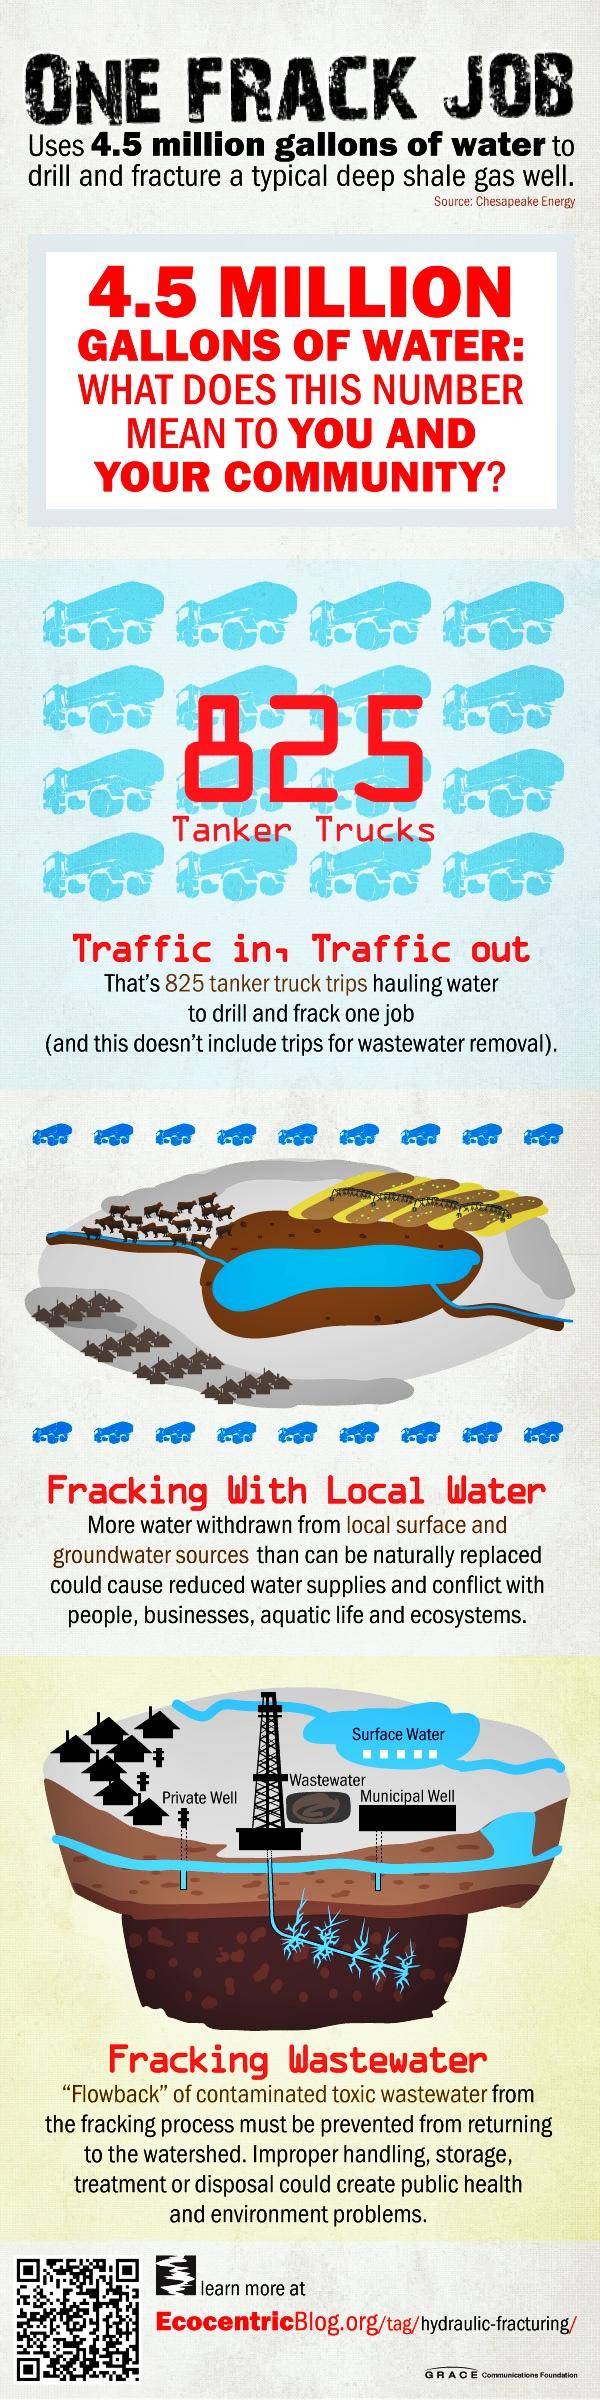 One frack job water usage